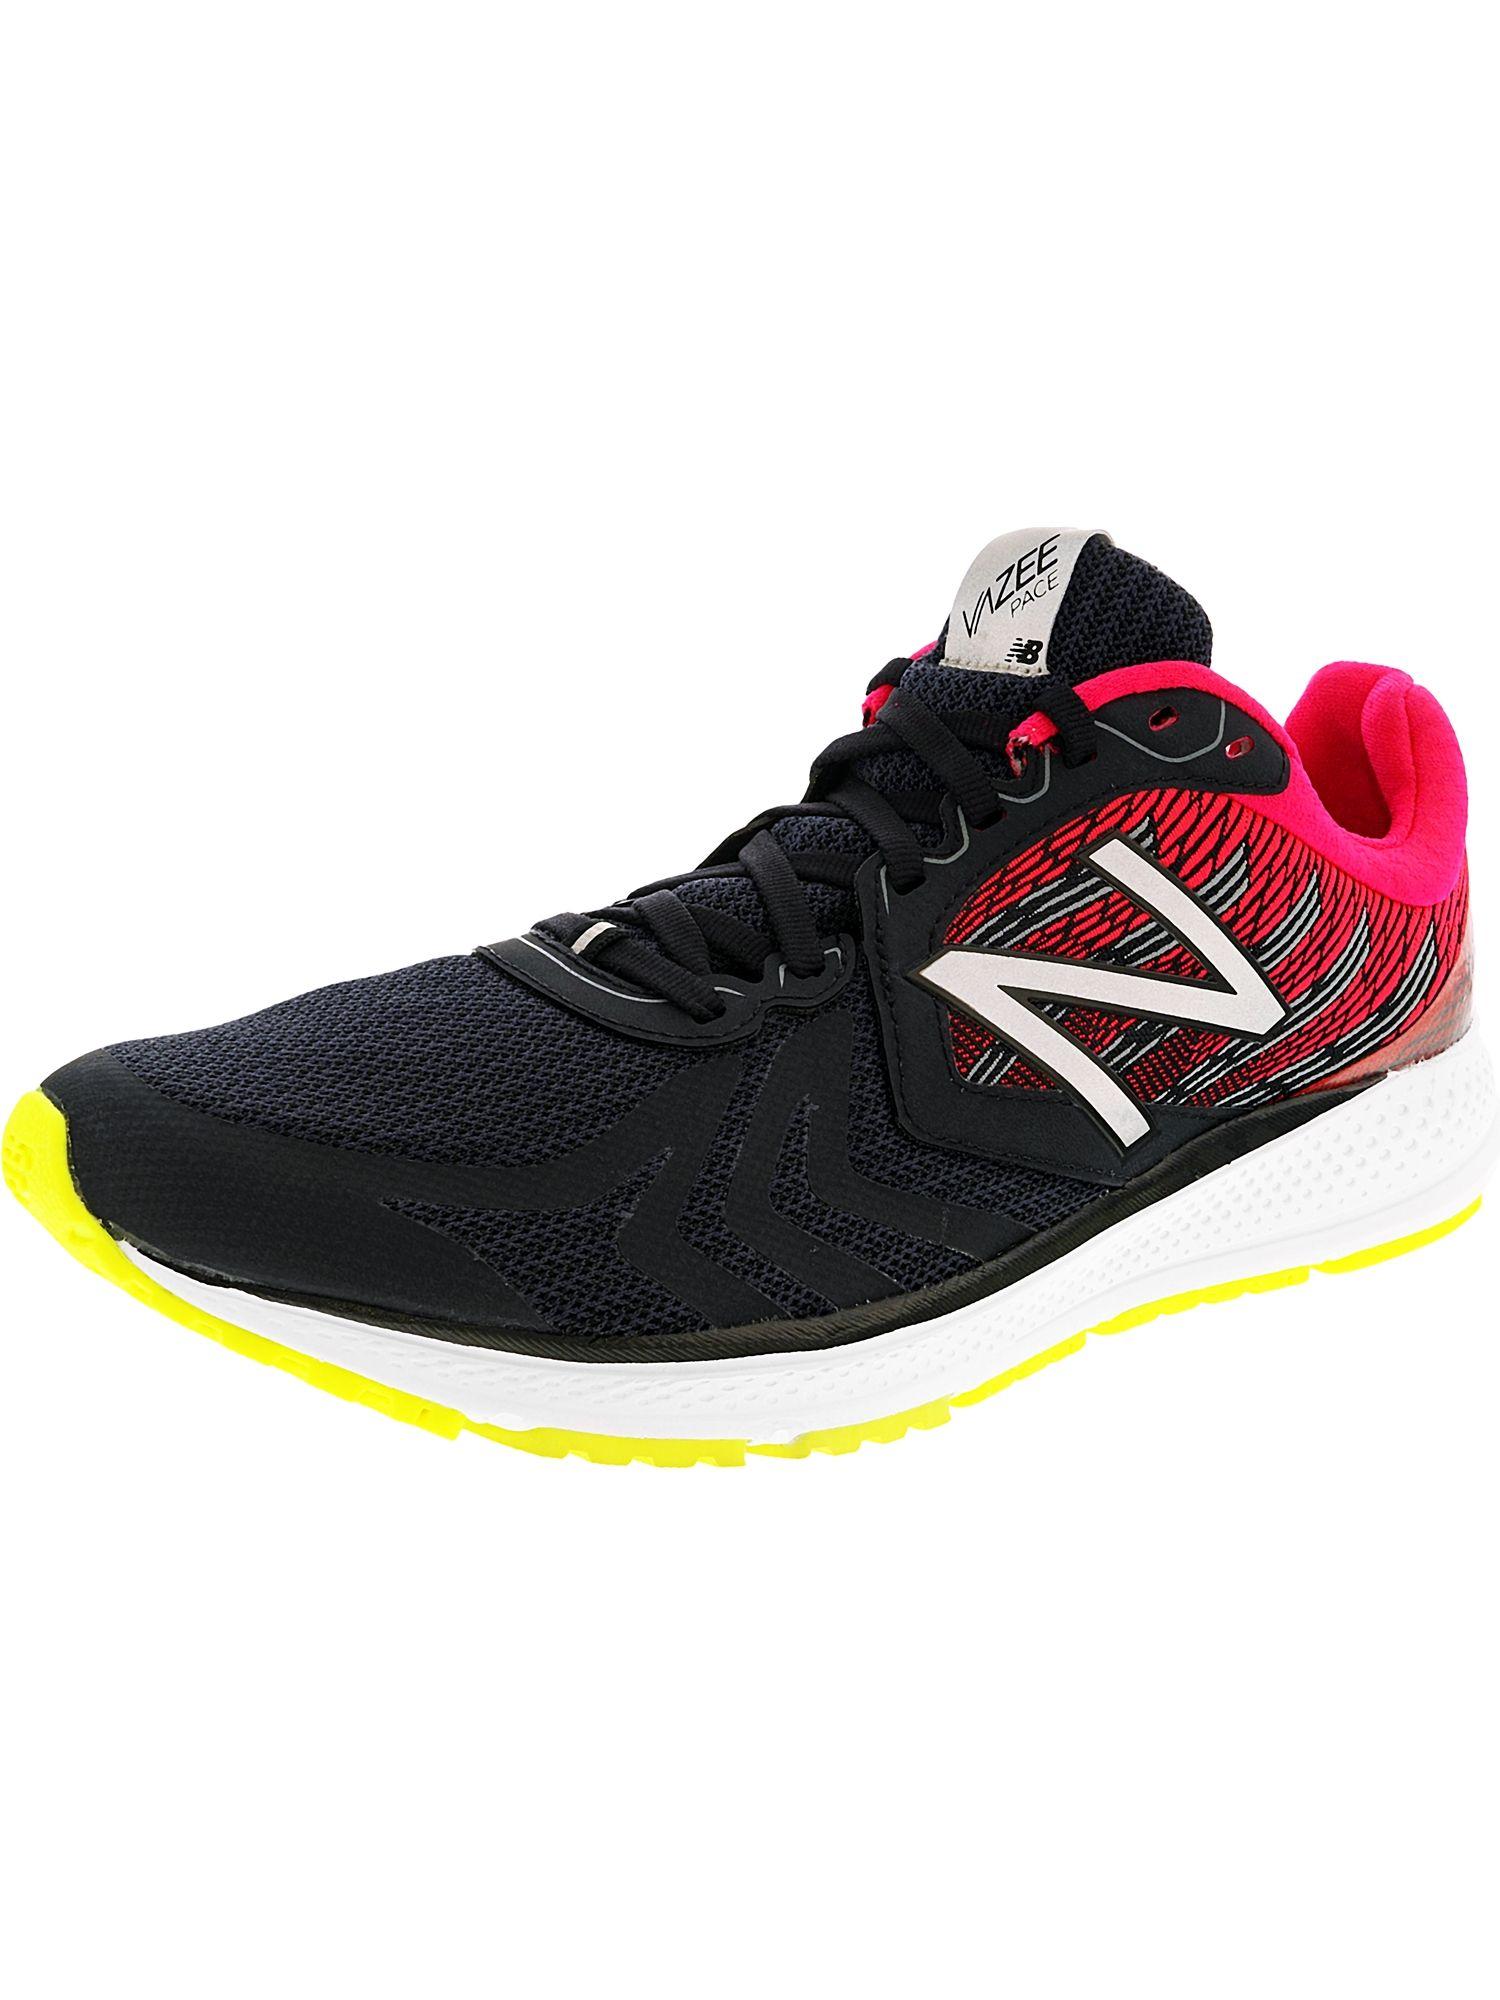 56a2085497abd NEW BALANCE NEW BALANCE MEN'S MPACE ANKLE-HIGH RUNNING SHOE. #newbalance # shoes